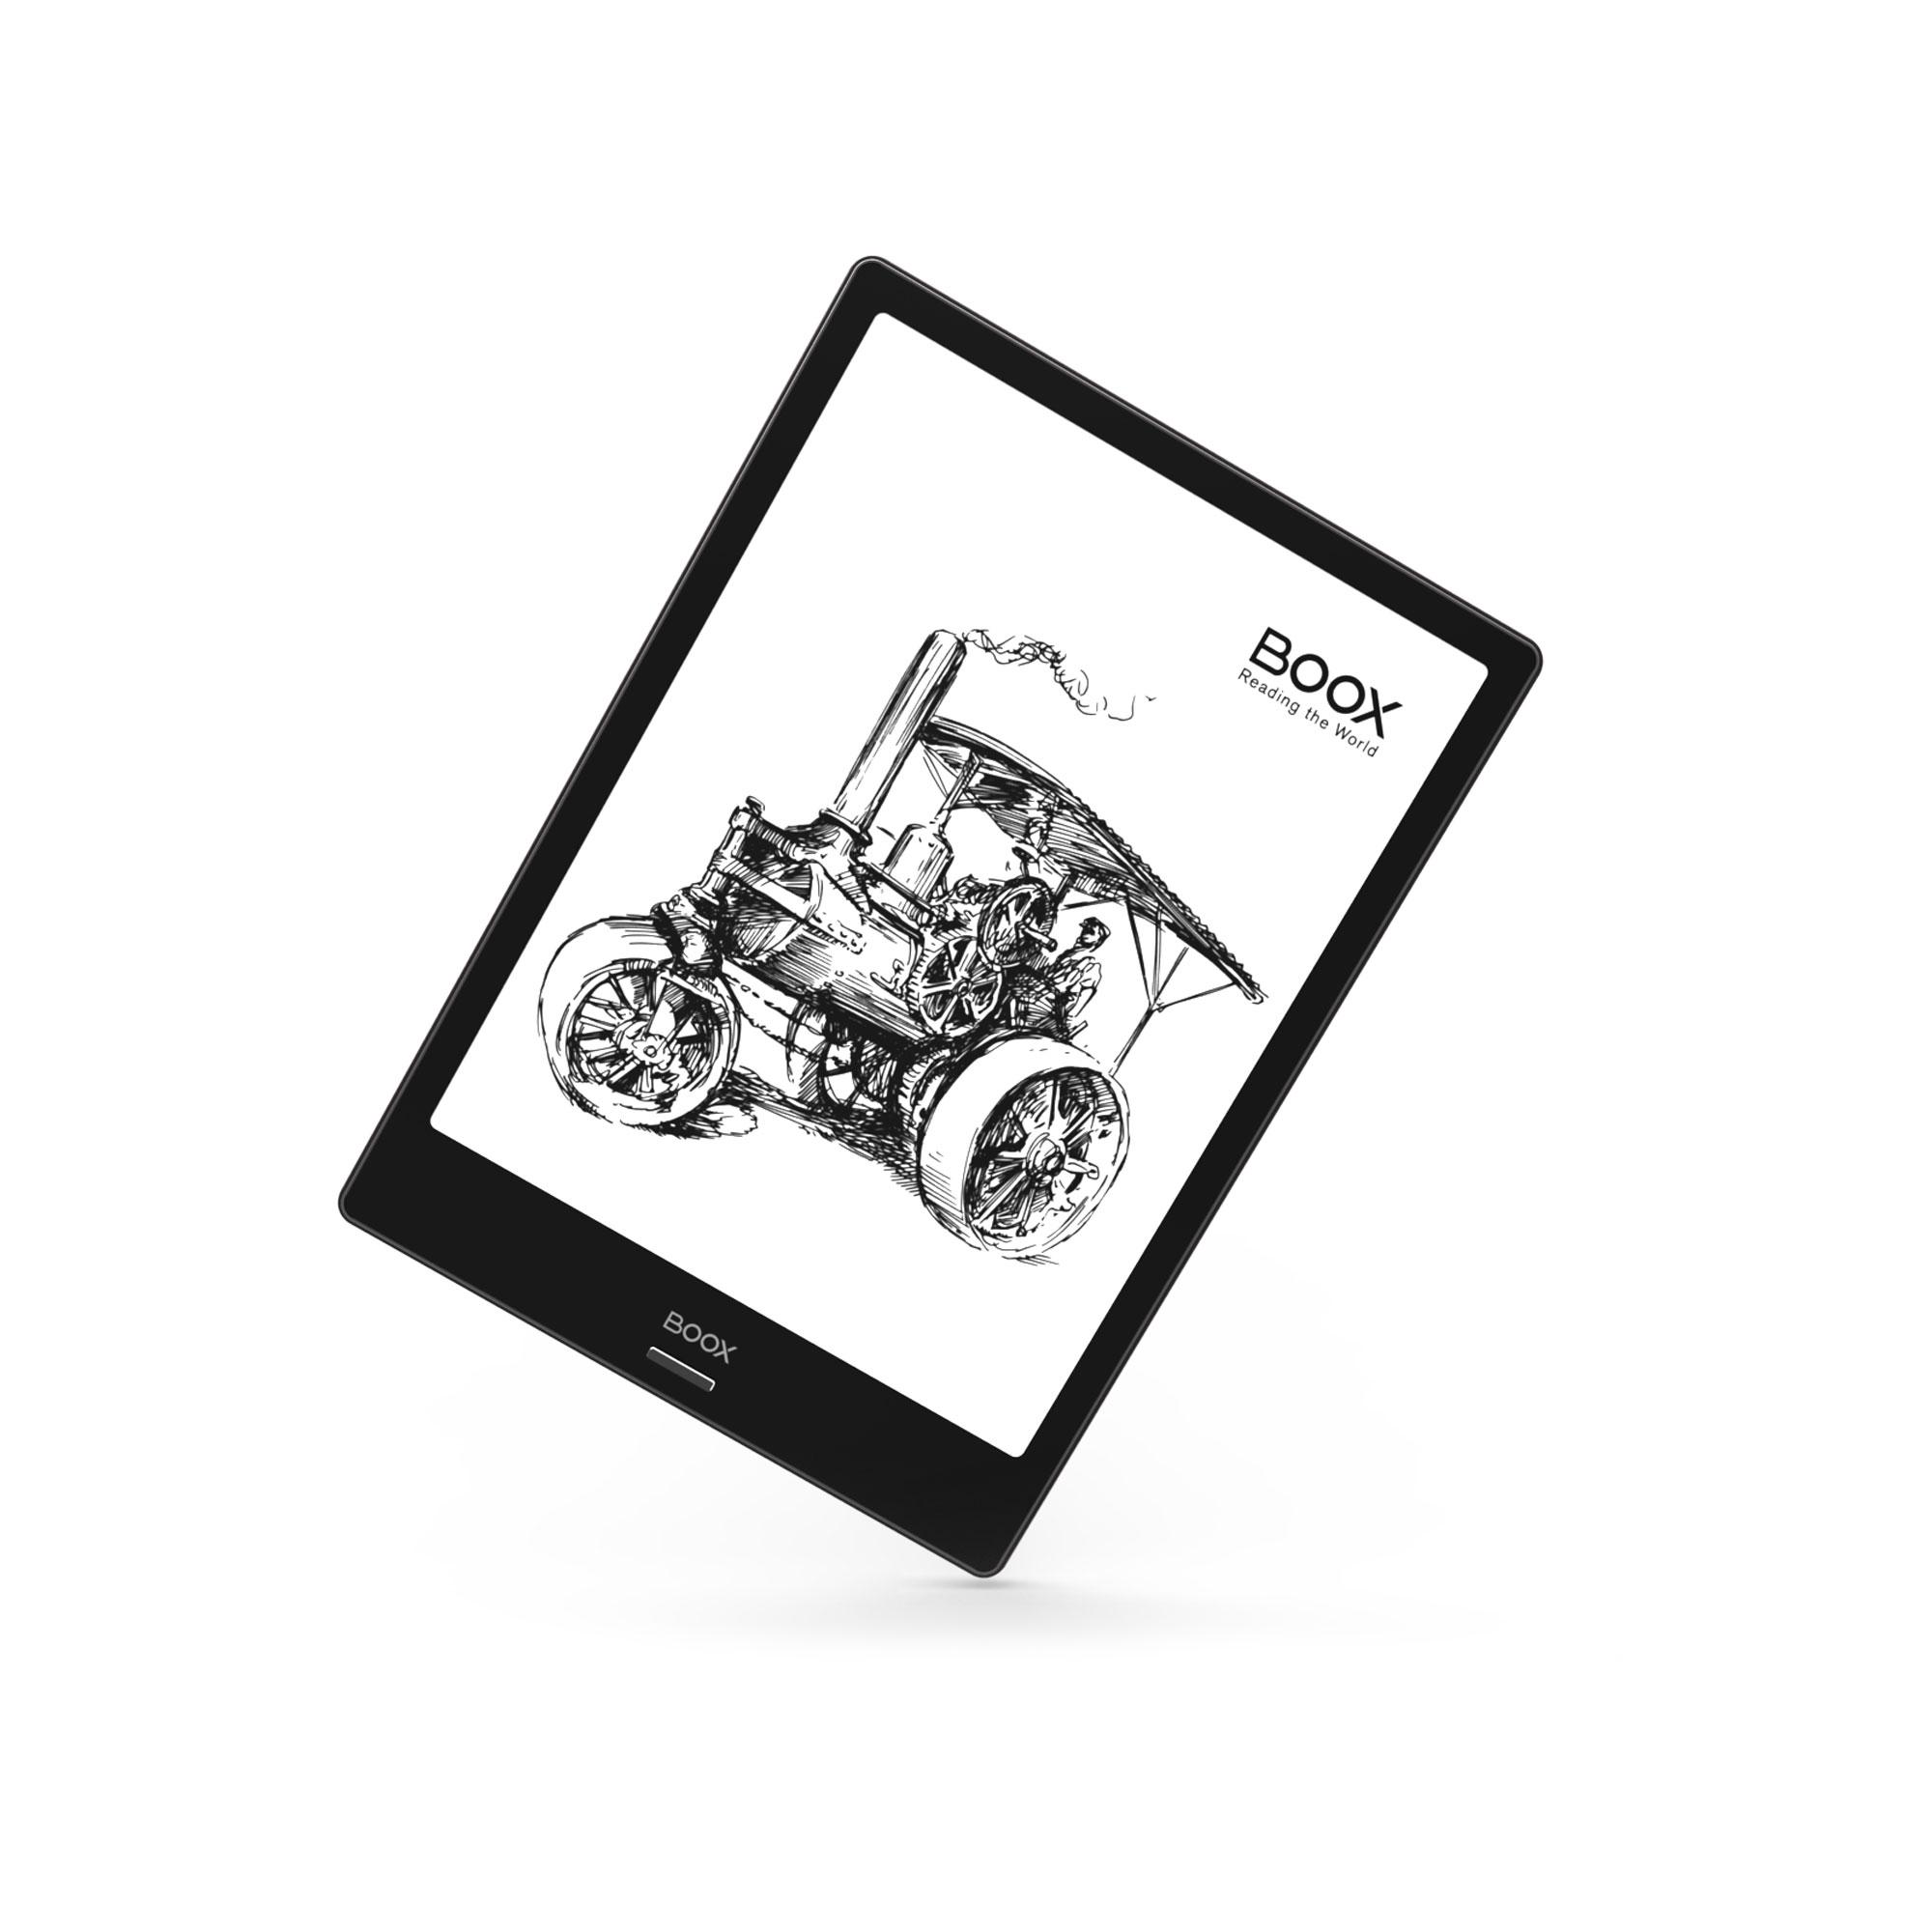 Onyx Boox Note Pro E Reader Device